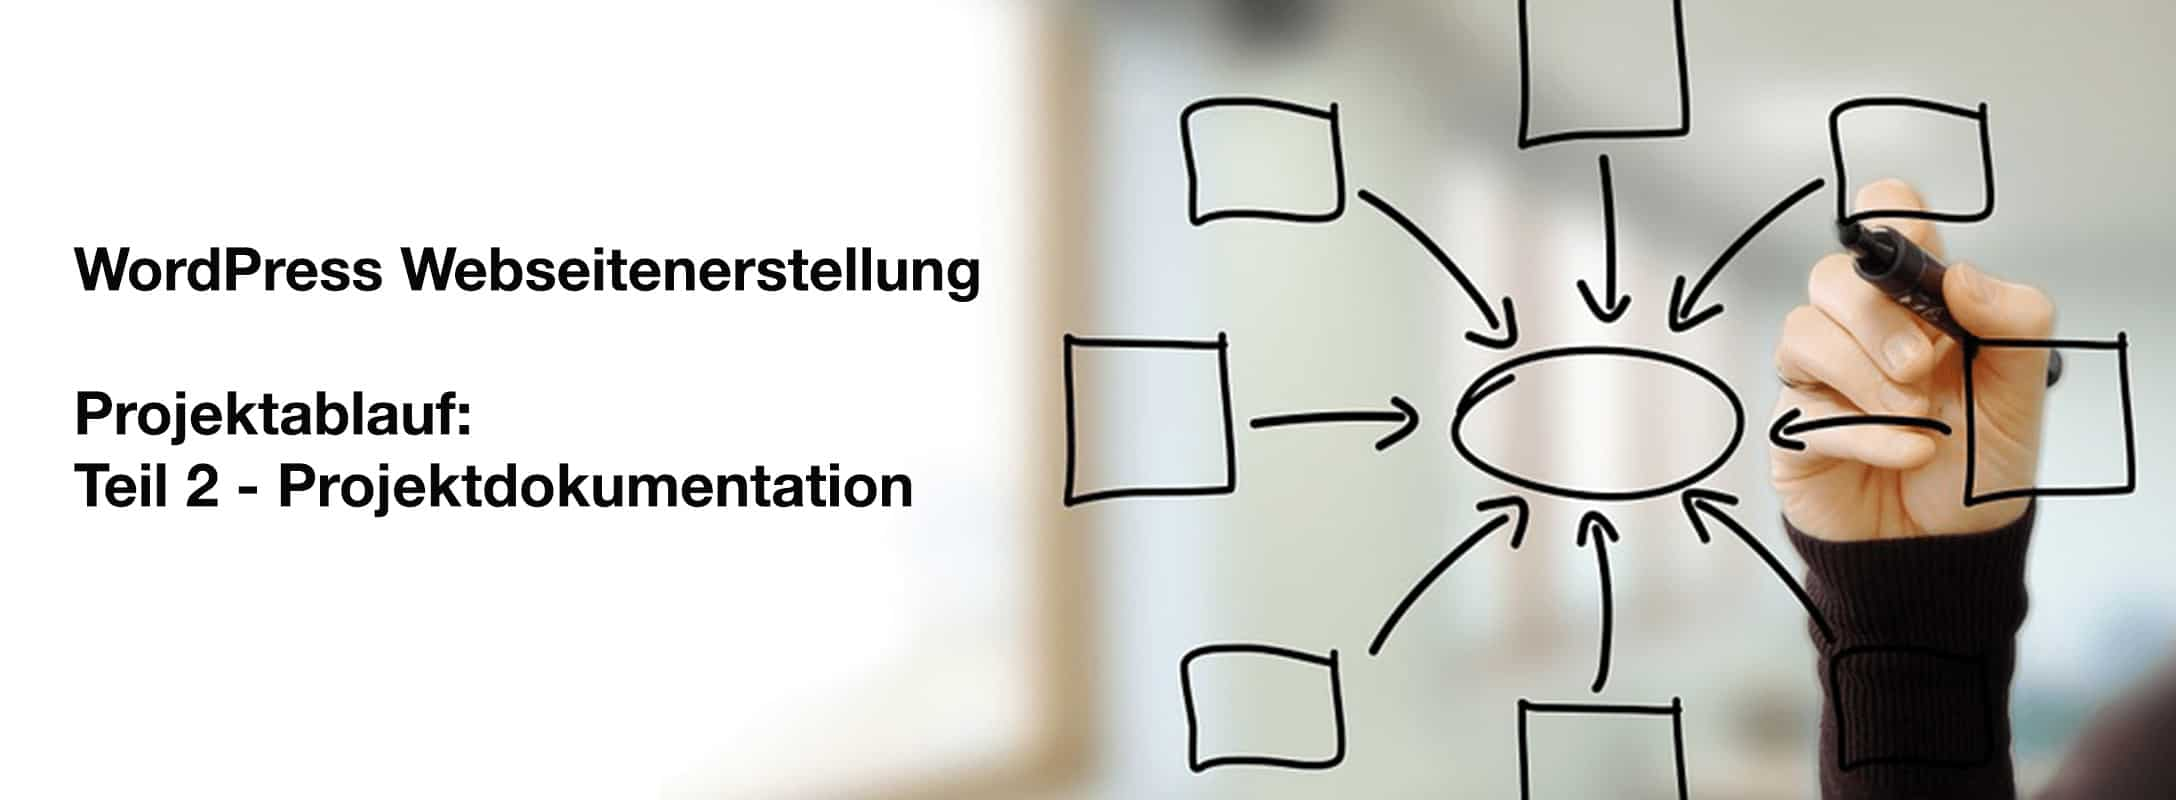 WordPress Webseitenerstellung - Projektablauf: Teil 2 - Projektdokumentation